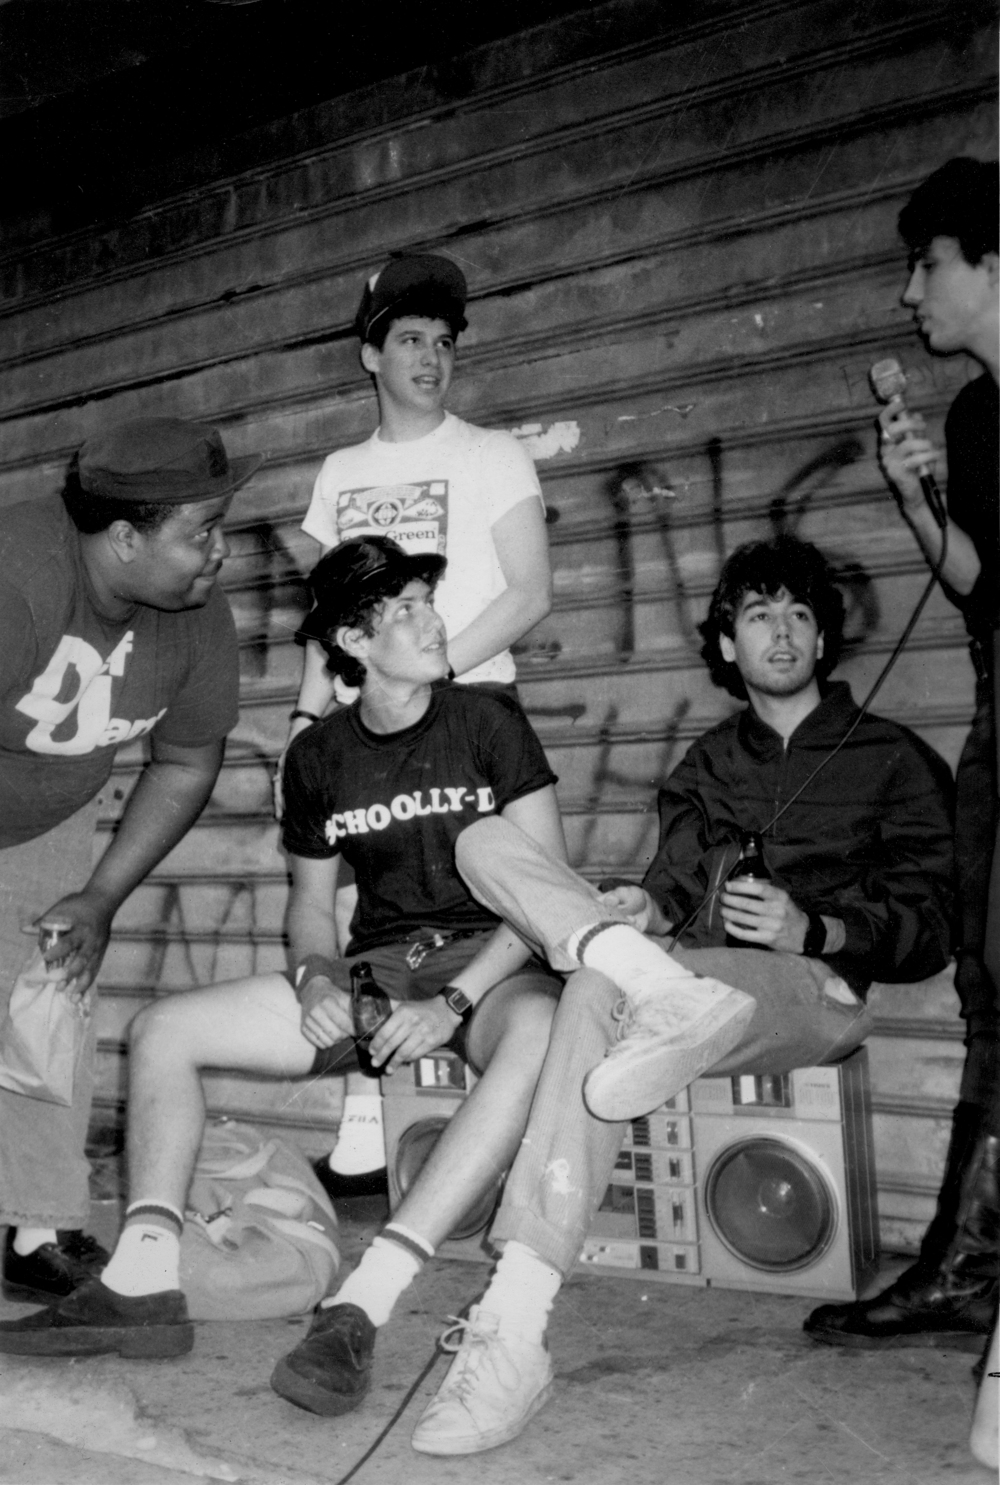 Beastie Boys © Ricky Powell